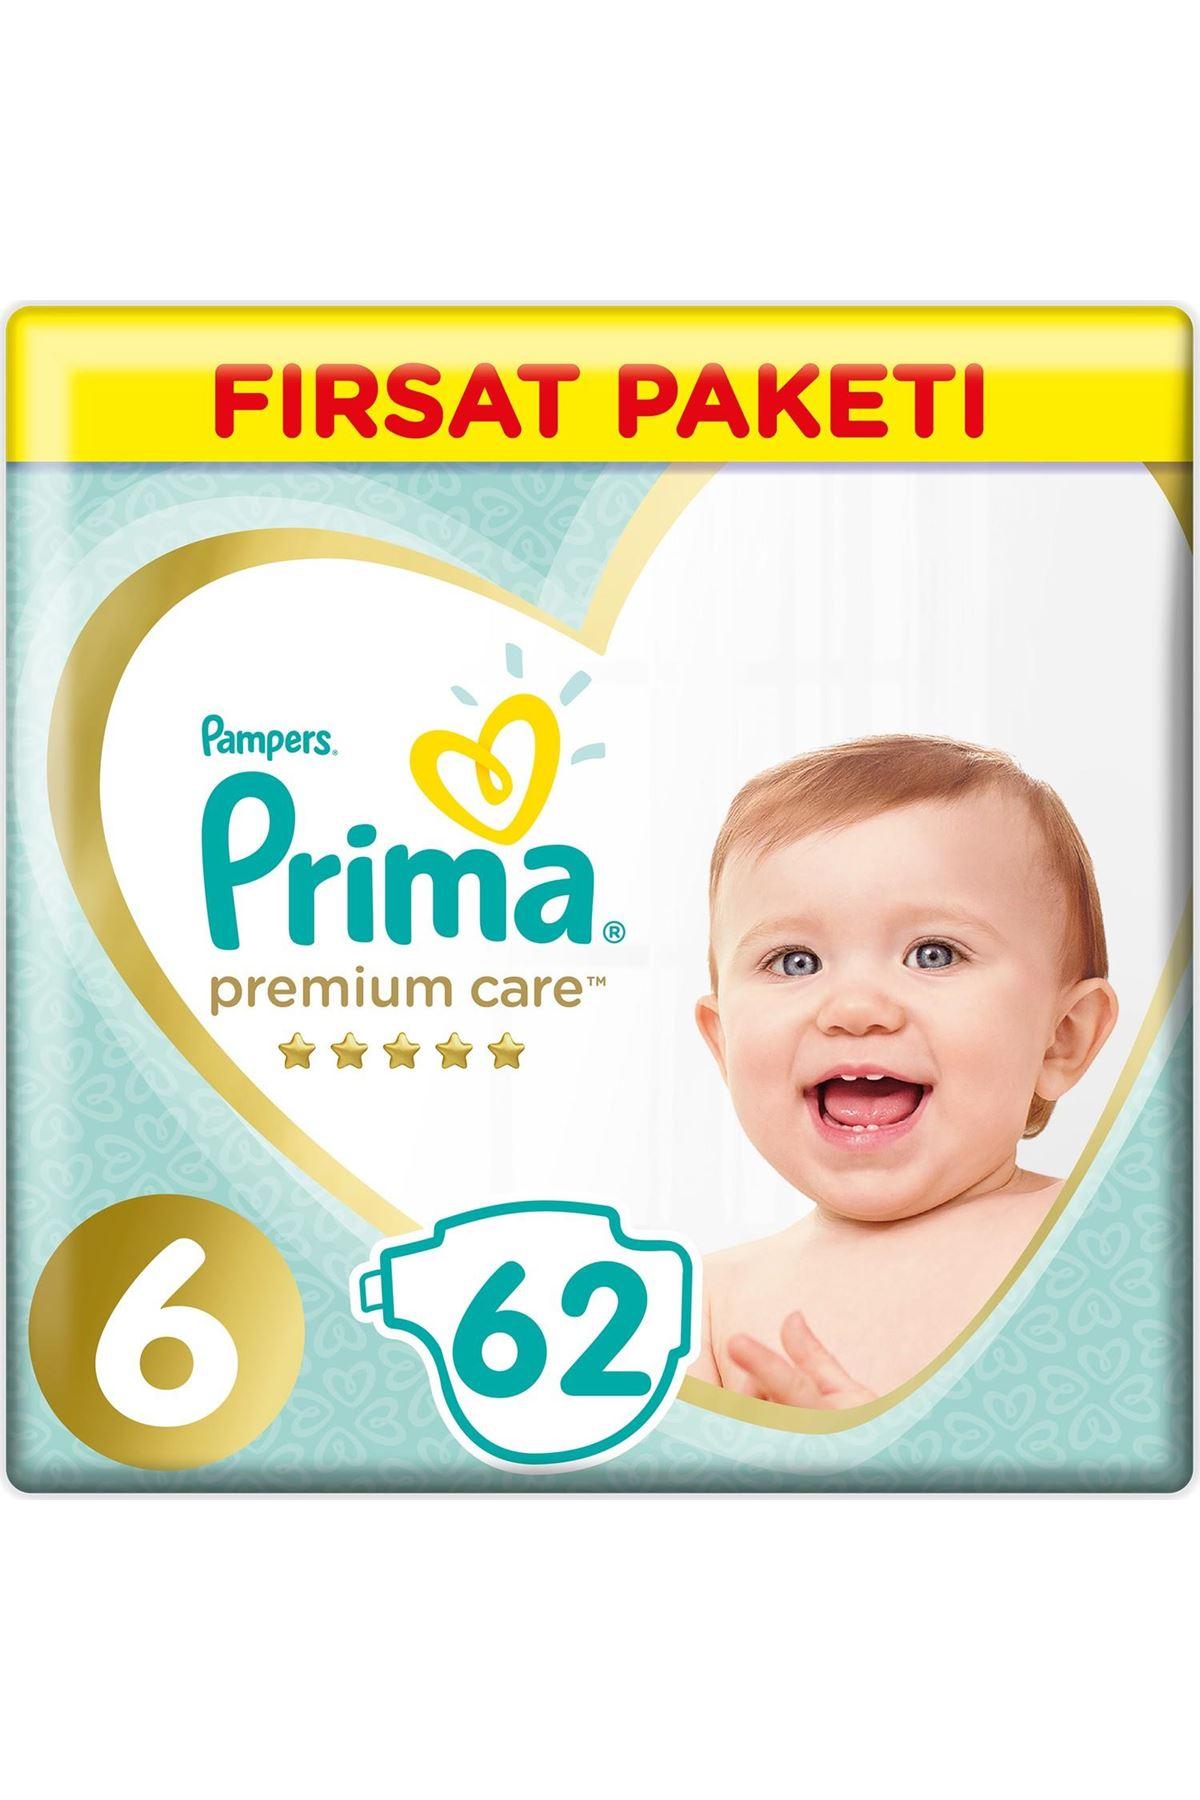 Prima Premium Care Bebek Bezi Fırsat Paketi 6 Beden 62 Adet